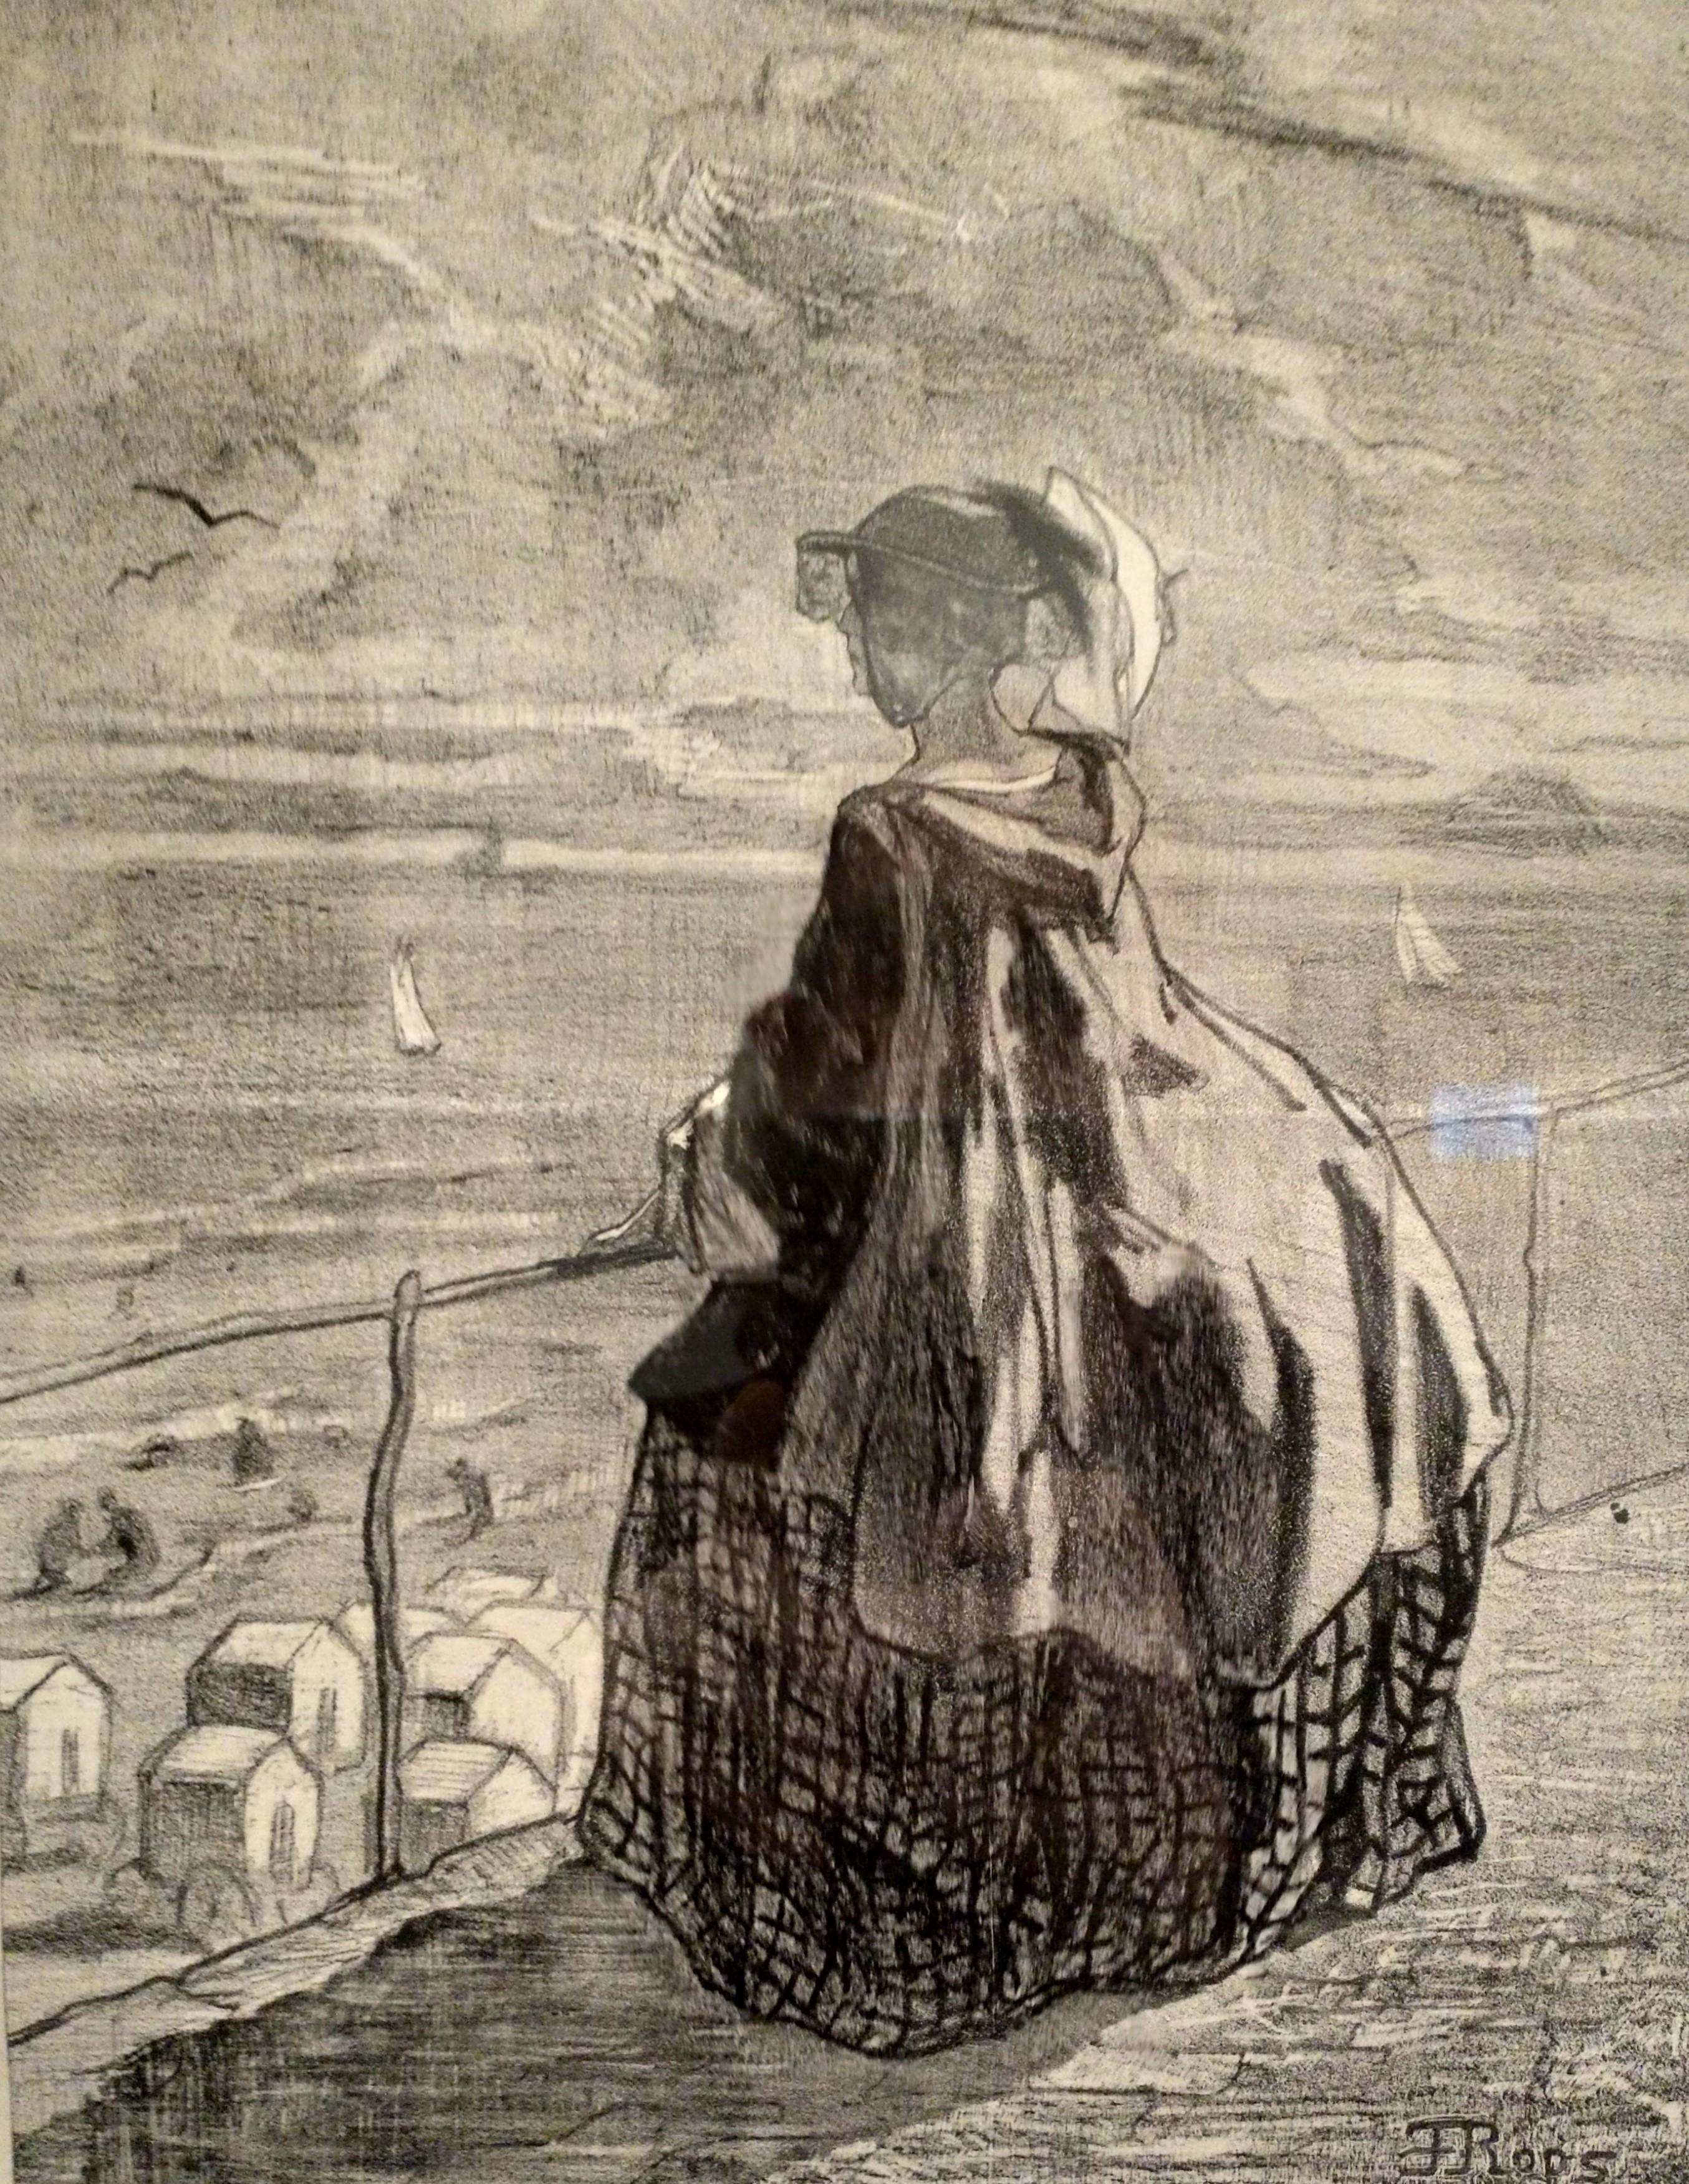 Rops Ostende avec Uylenspiegel, no. 29, 16 August 1857